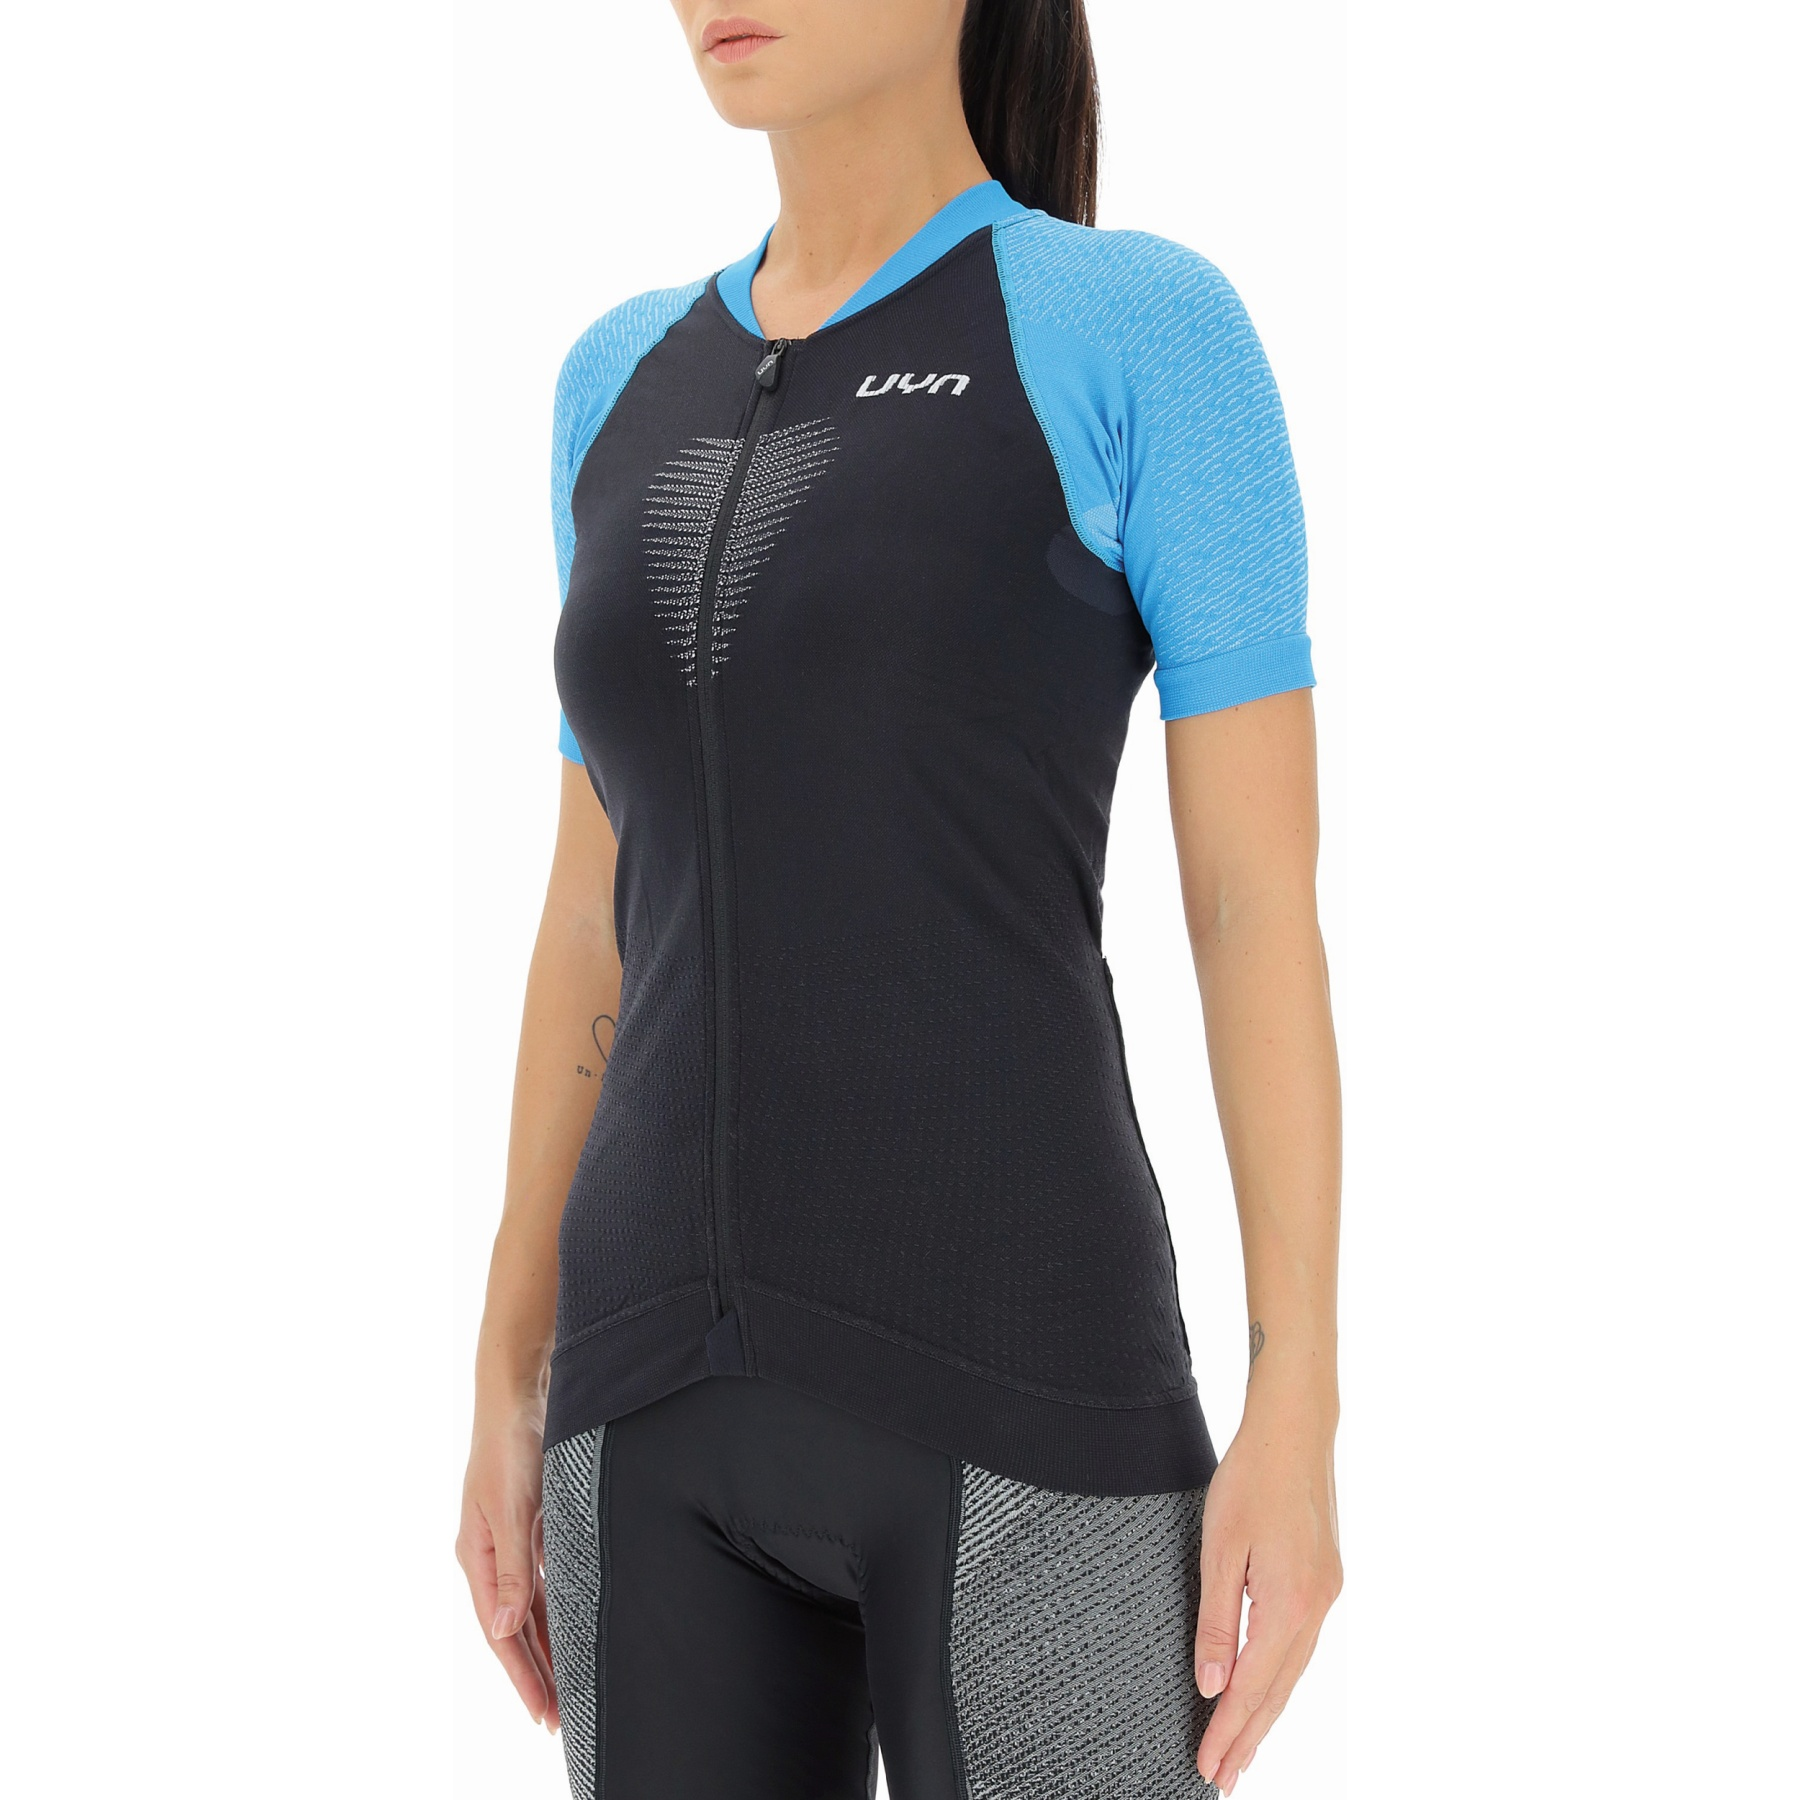 Bild von UYN Granfondo Damen Fahrrad Kurzärmliges Shirt - Blackboard/Danube Blue